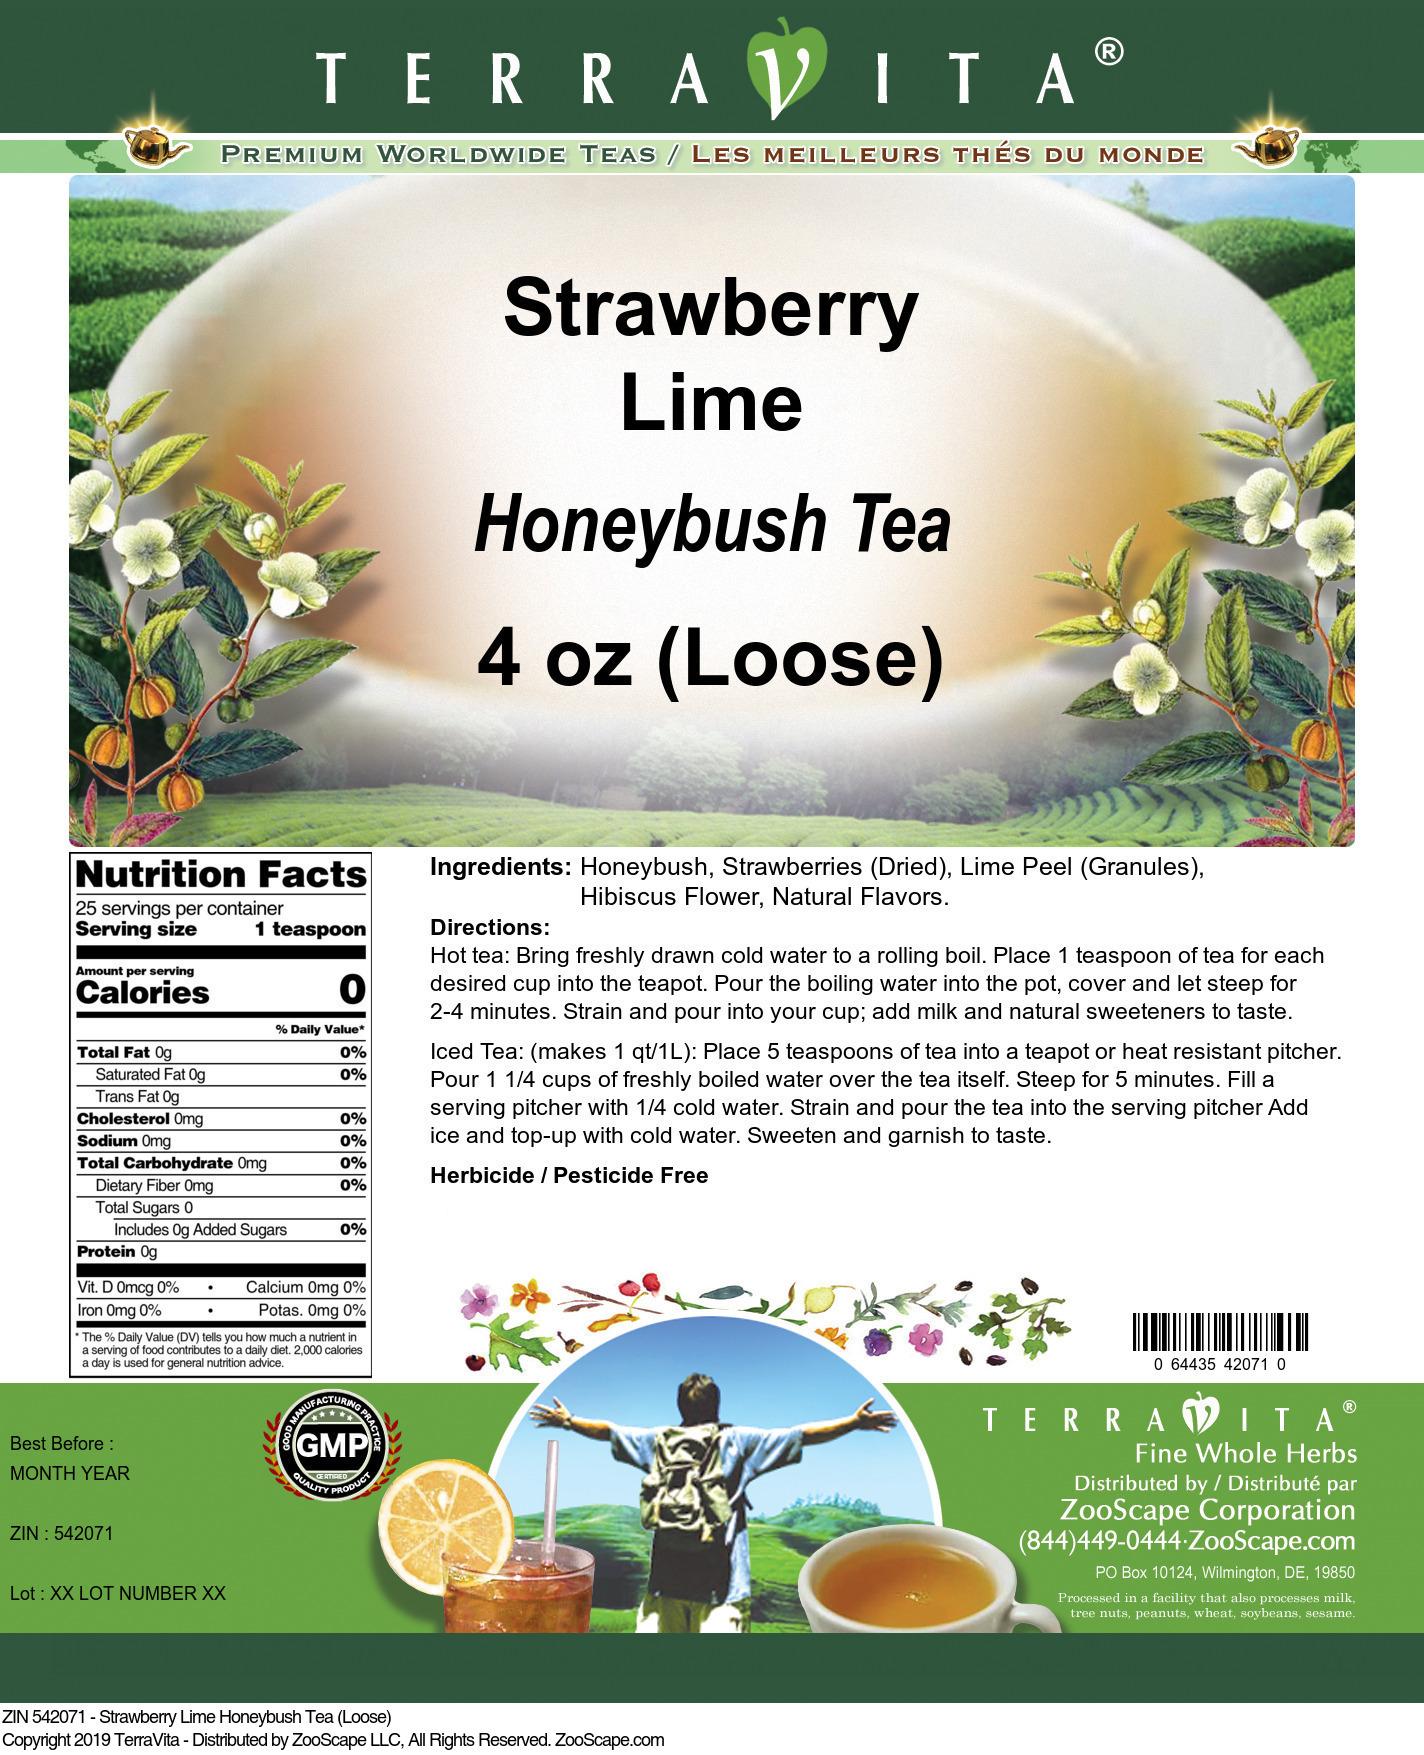 Strawberry Lime Honeybush Tea (Loose)